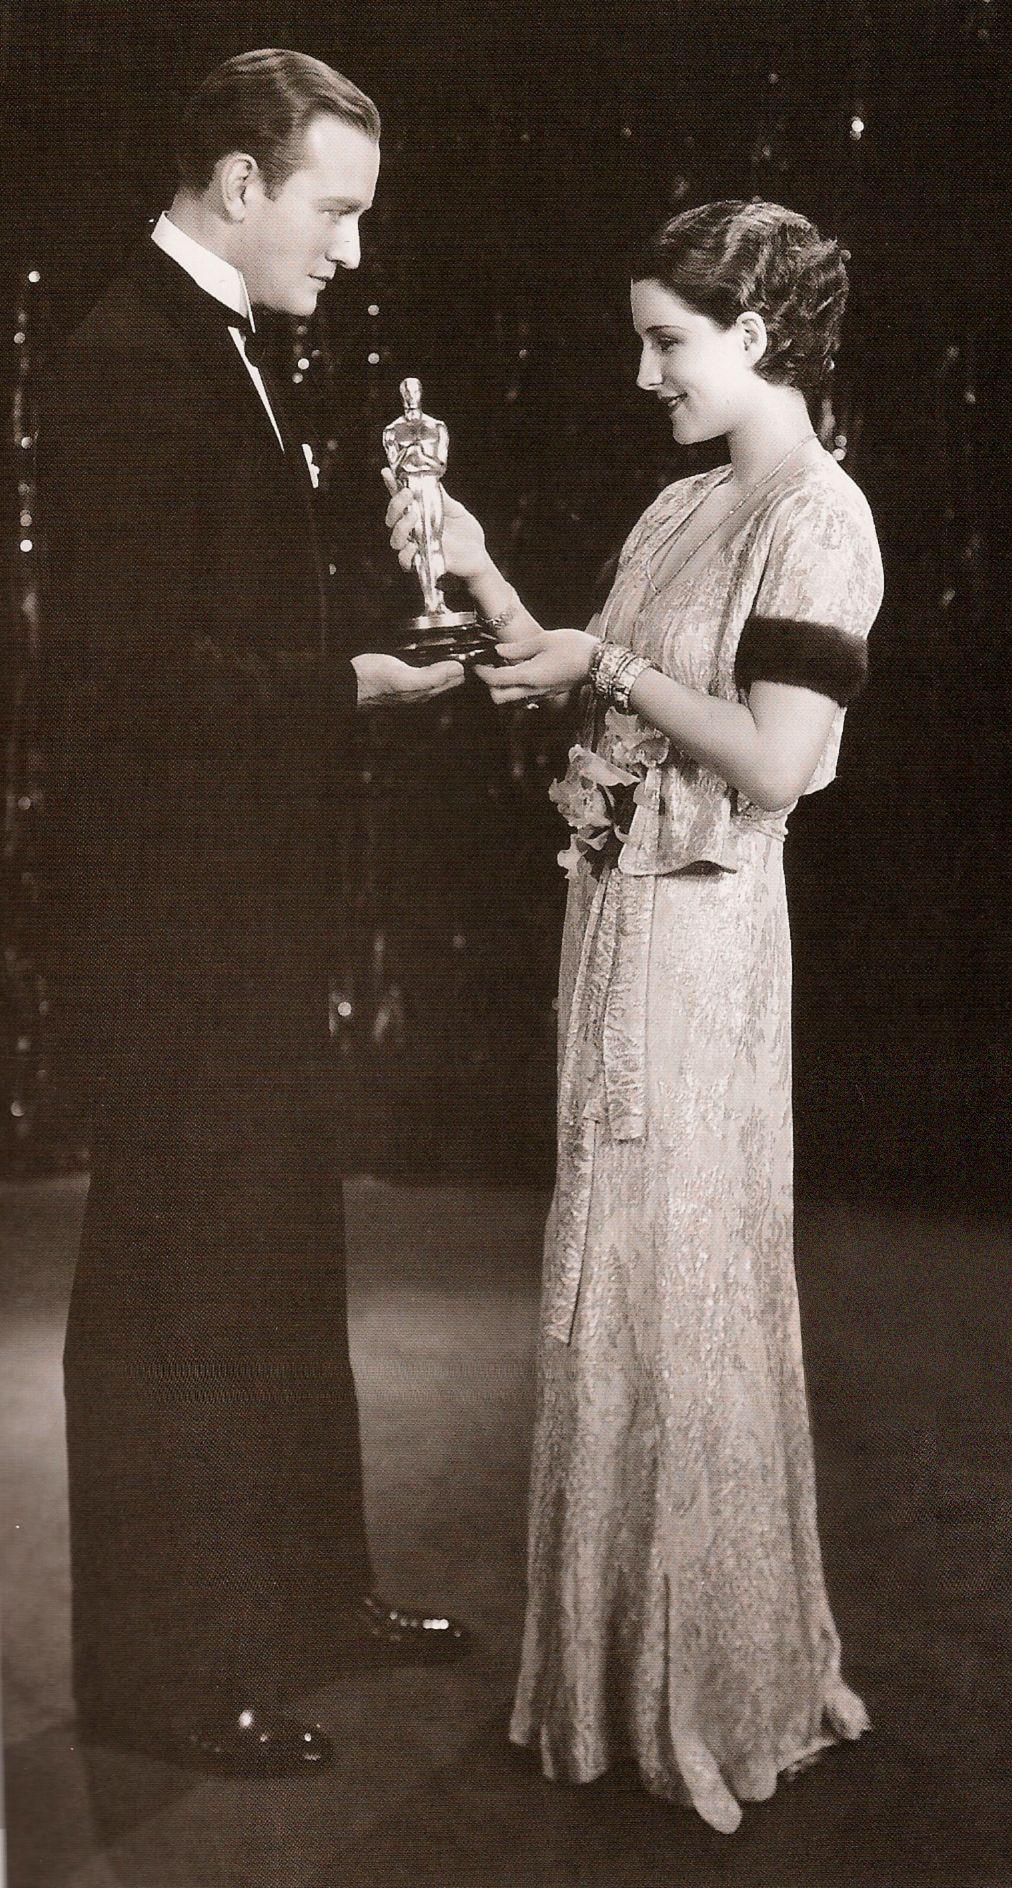 Norma Shearer and John Wayne at the 1930 Oscars